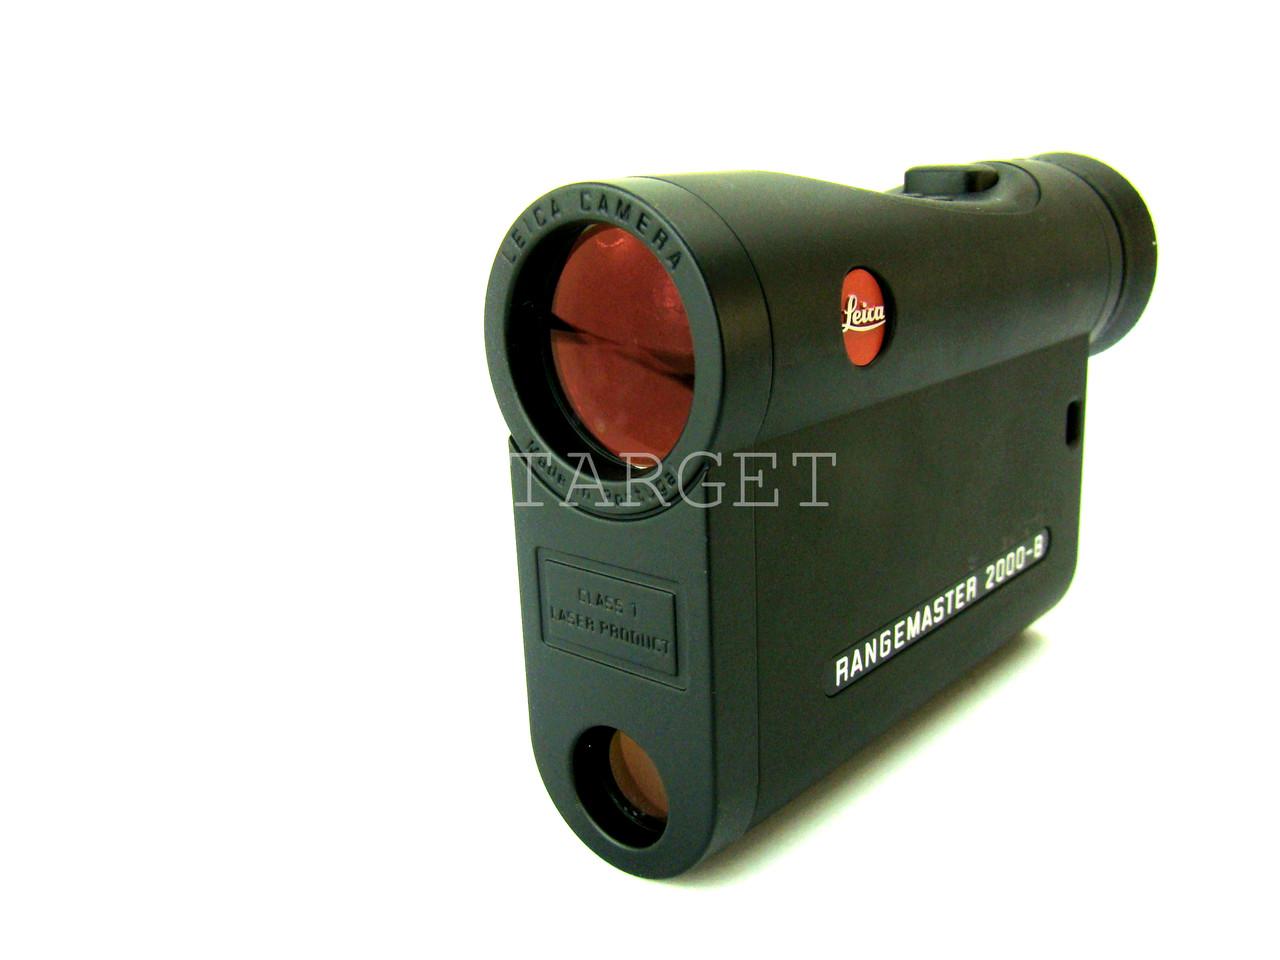 Leica Entfernungsmesser Crf : Лазерный дальномер leica rangemaster crf b продажа цена в